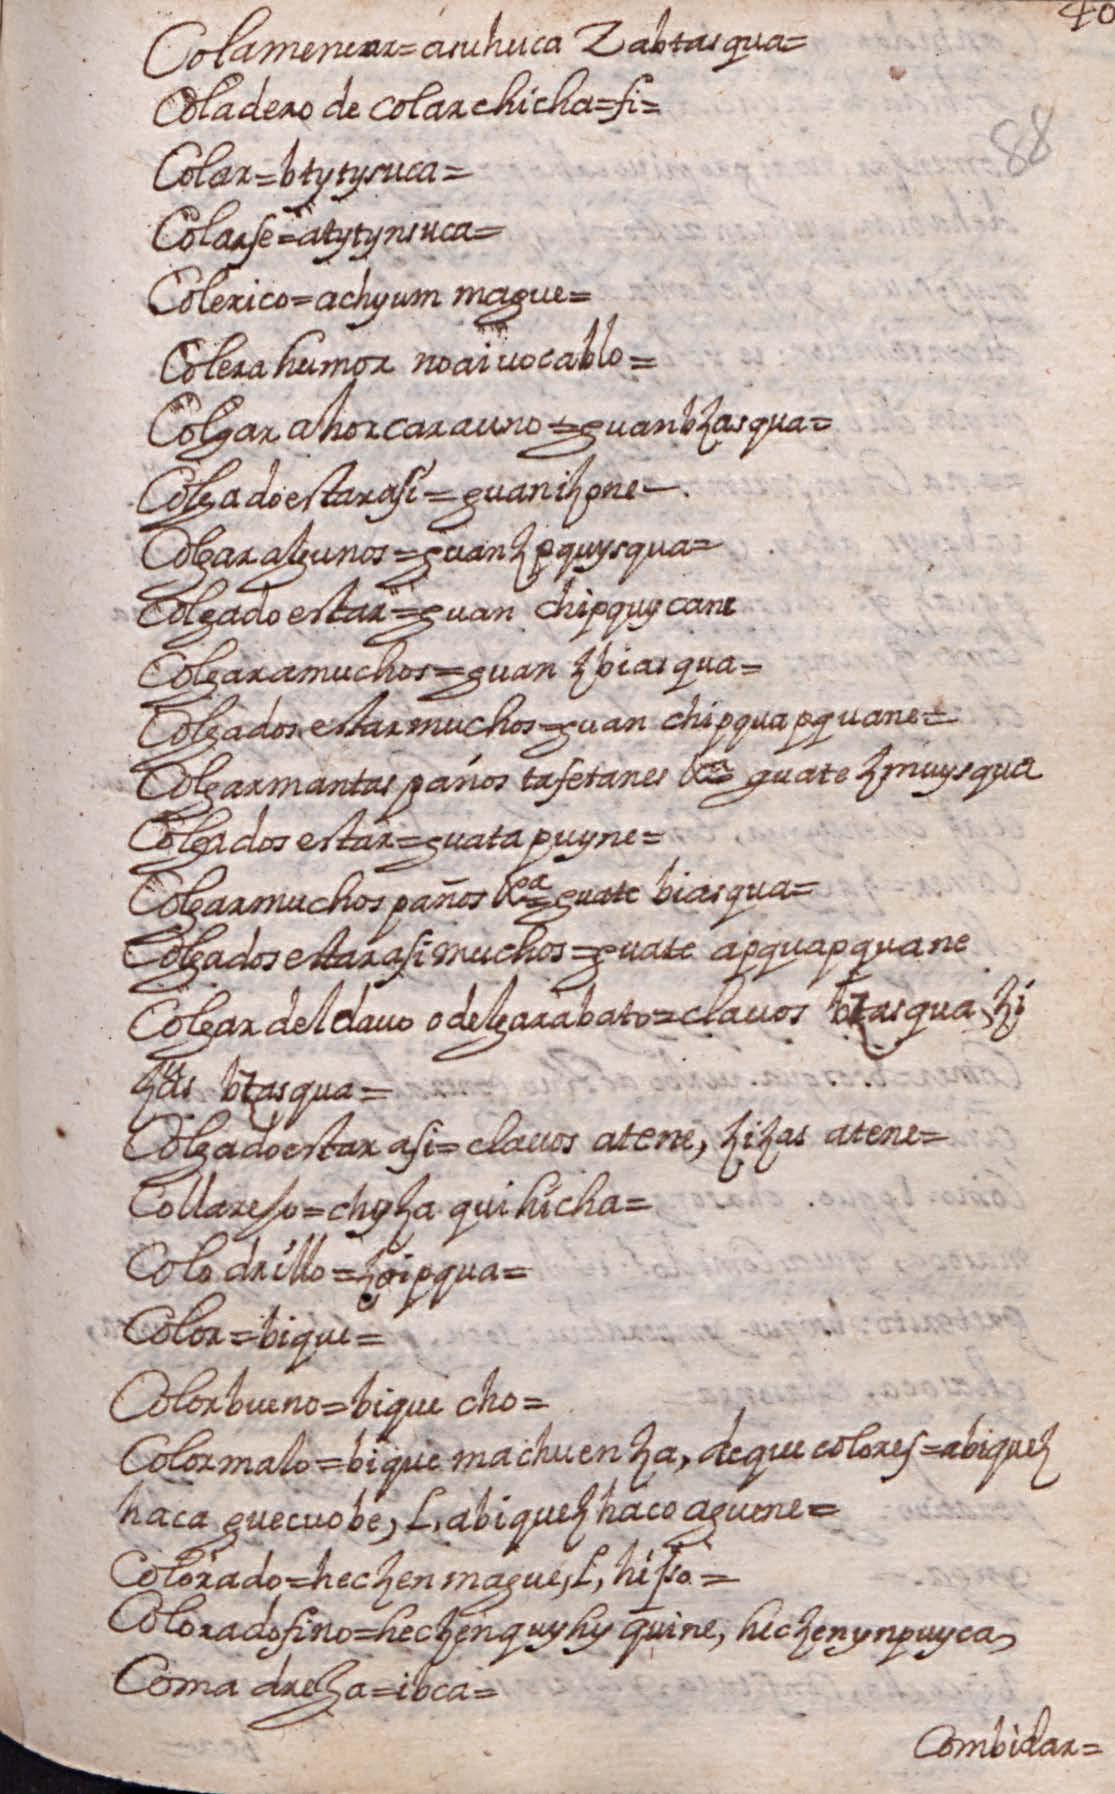 Manuscrito 158 BNC Vocabulario - fol 40r.jpg